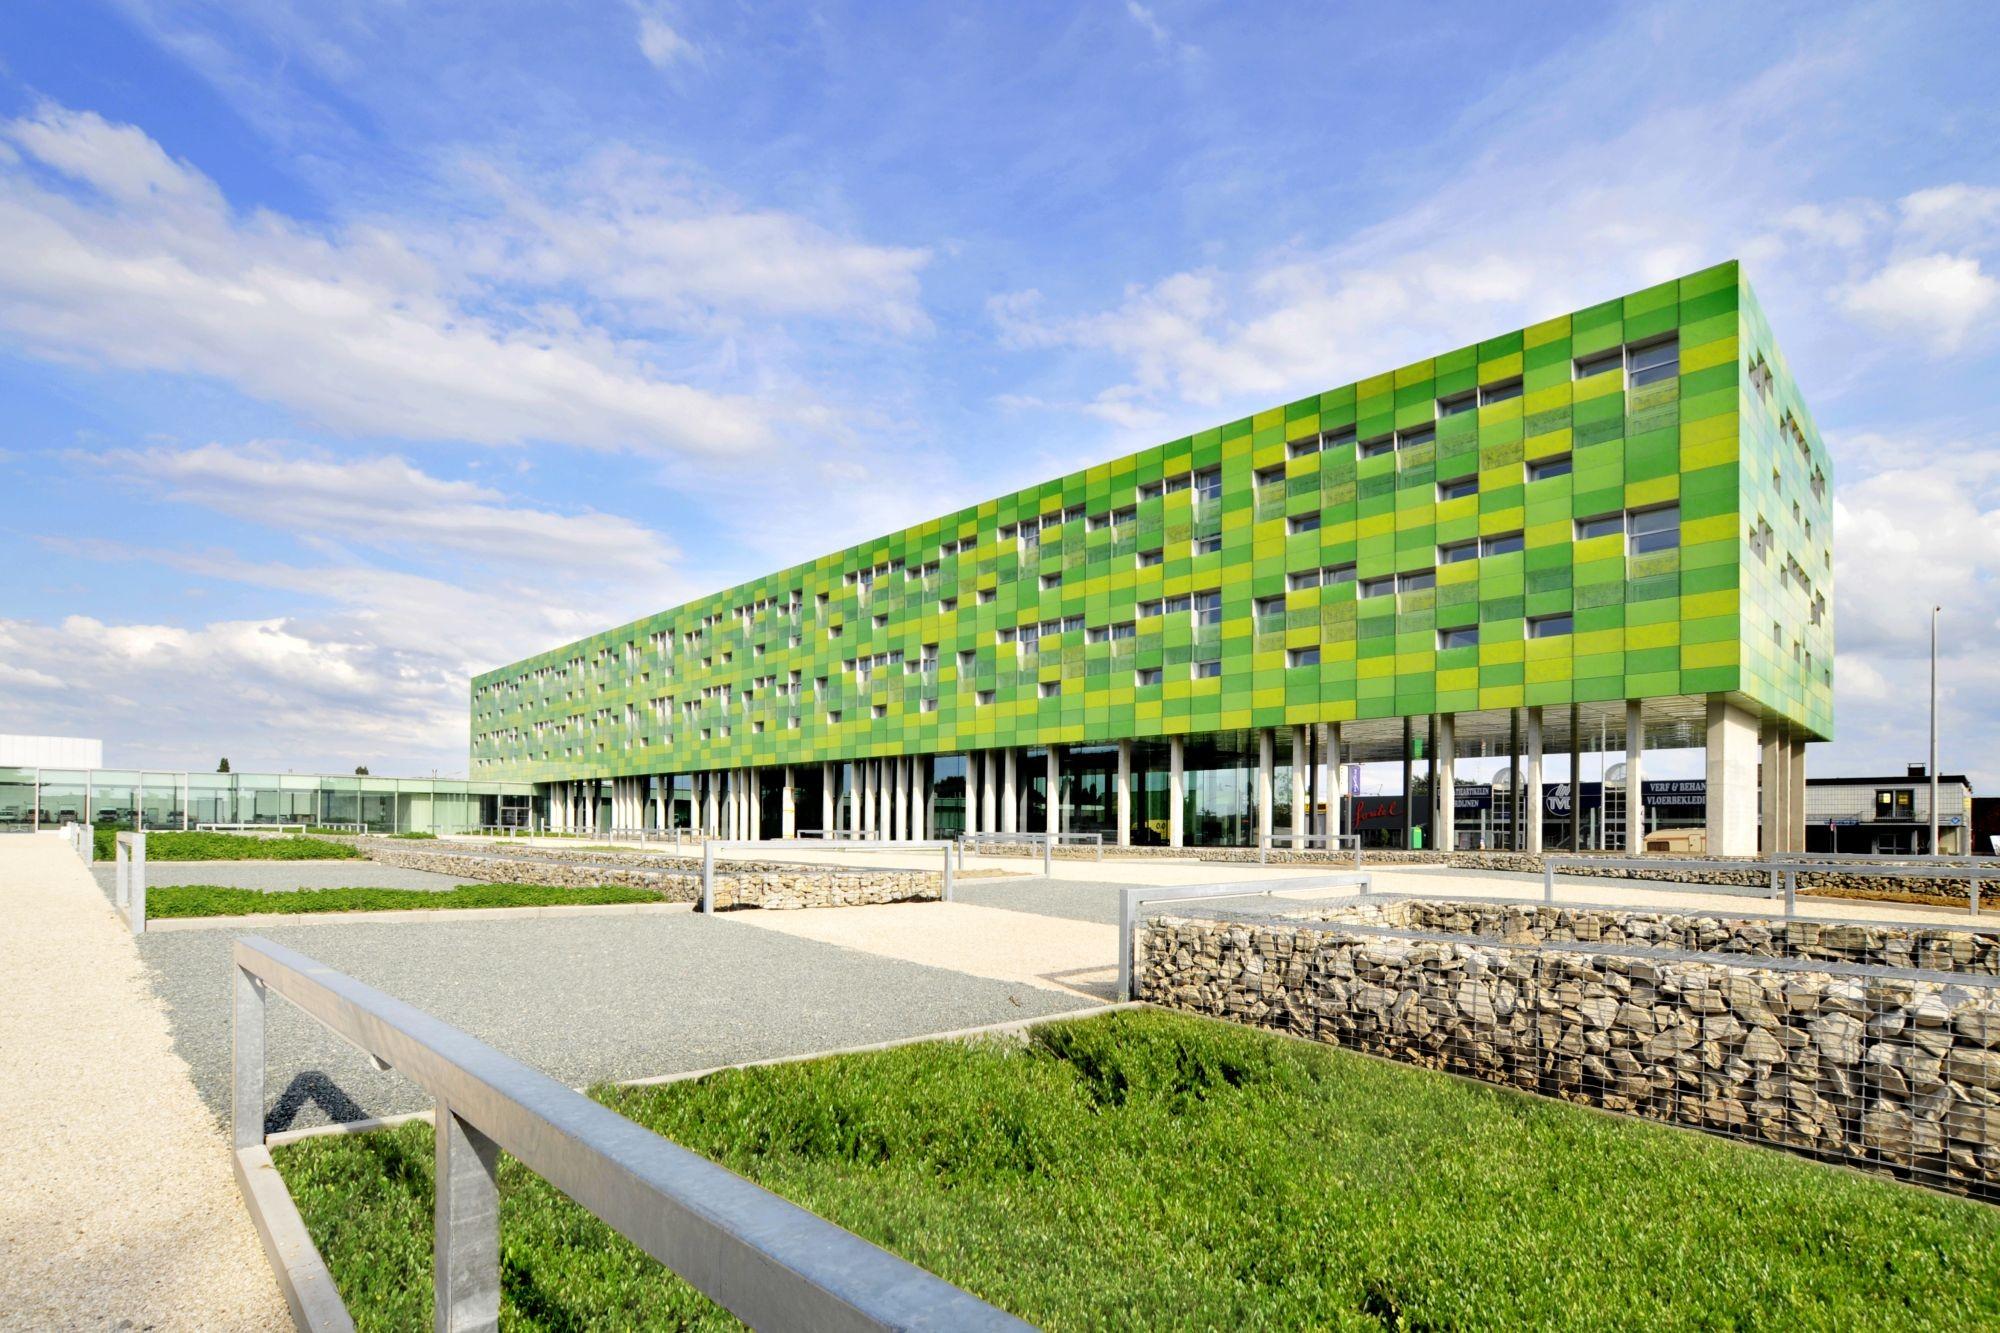 Offices Infrax West Torhout / Crepain Binst Architecture, Courtesy of Crepain Binst Architecture